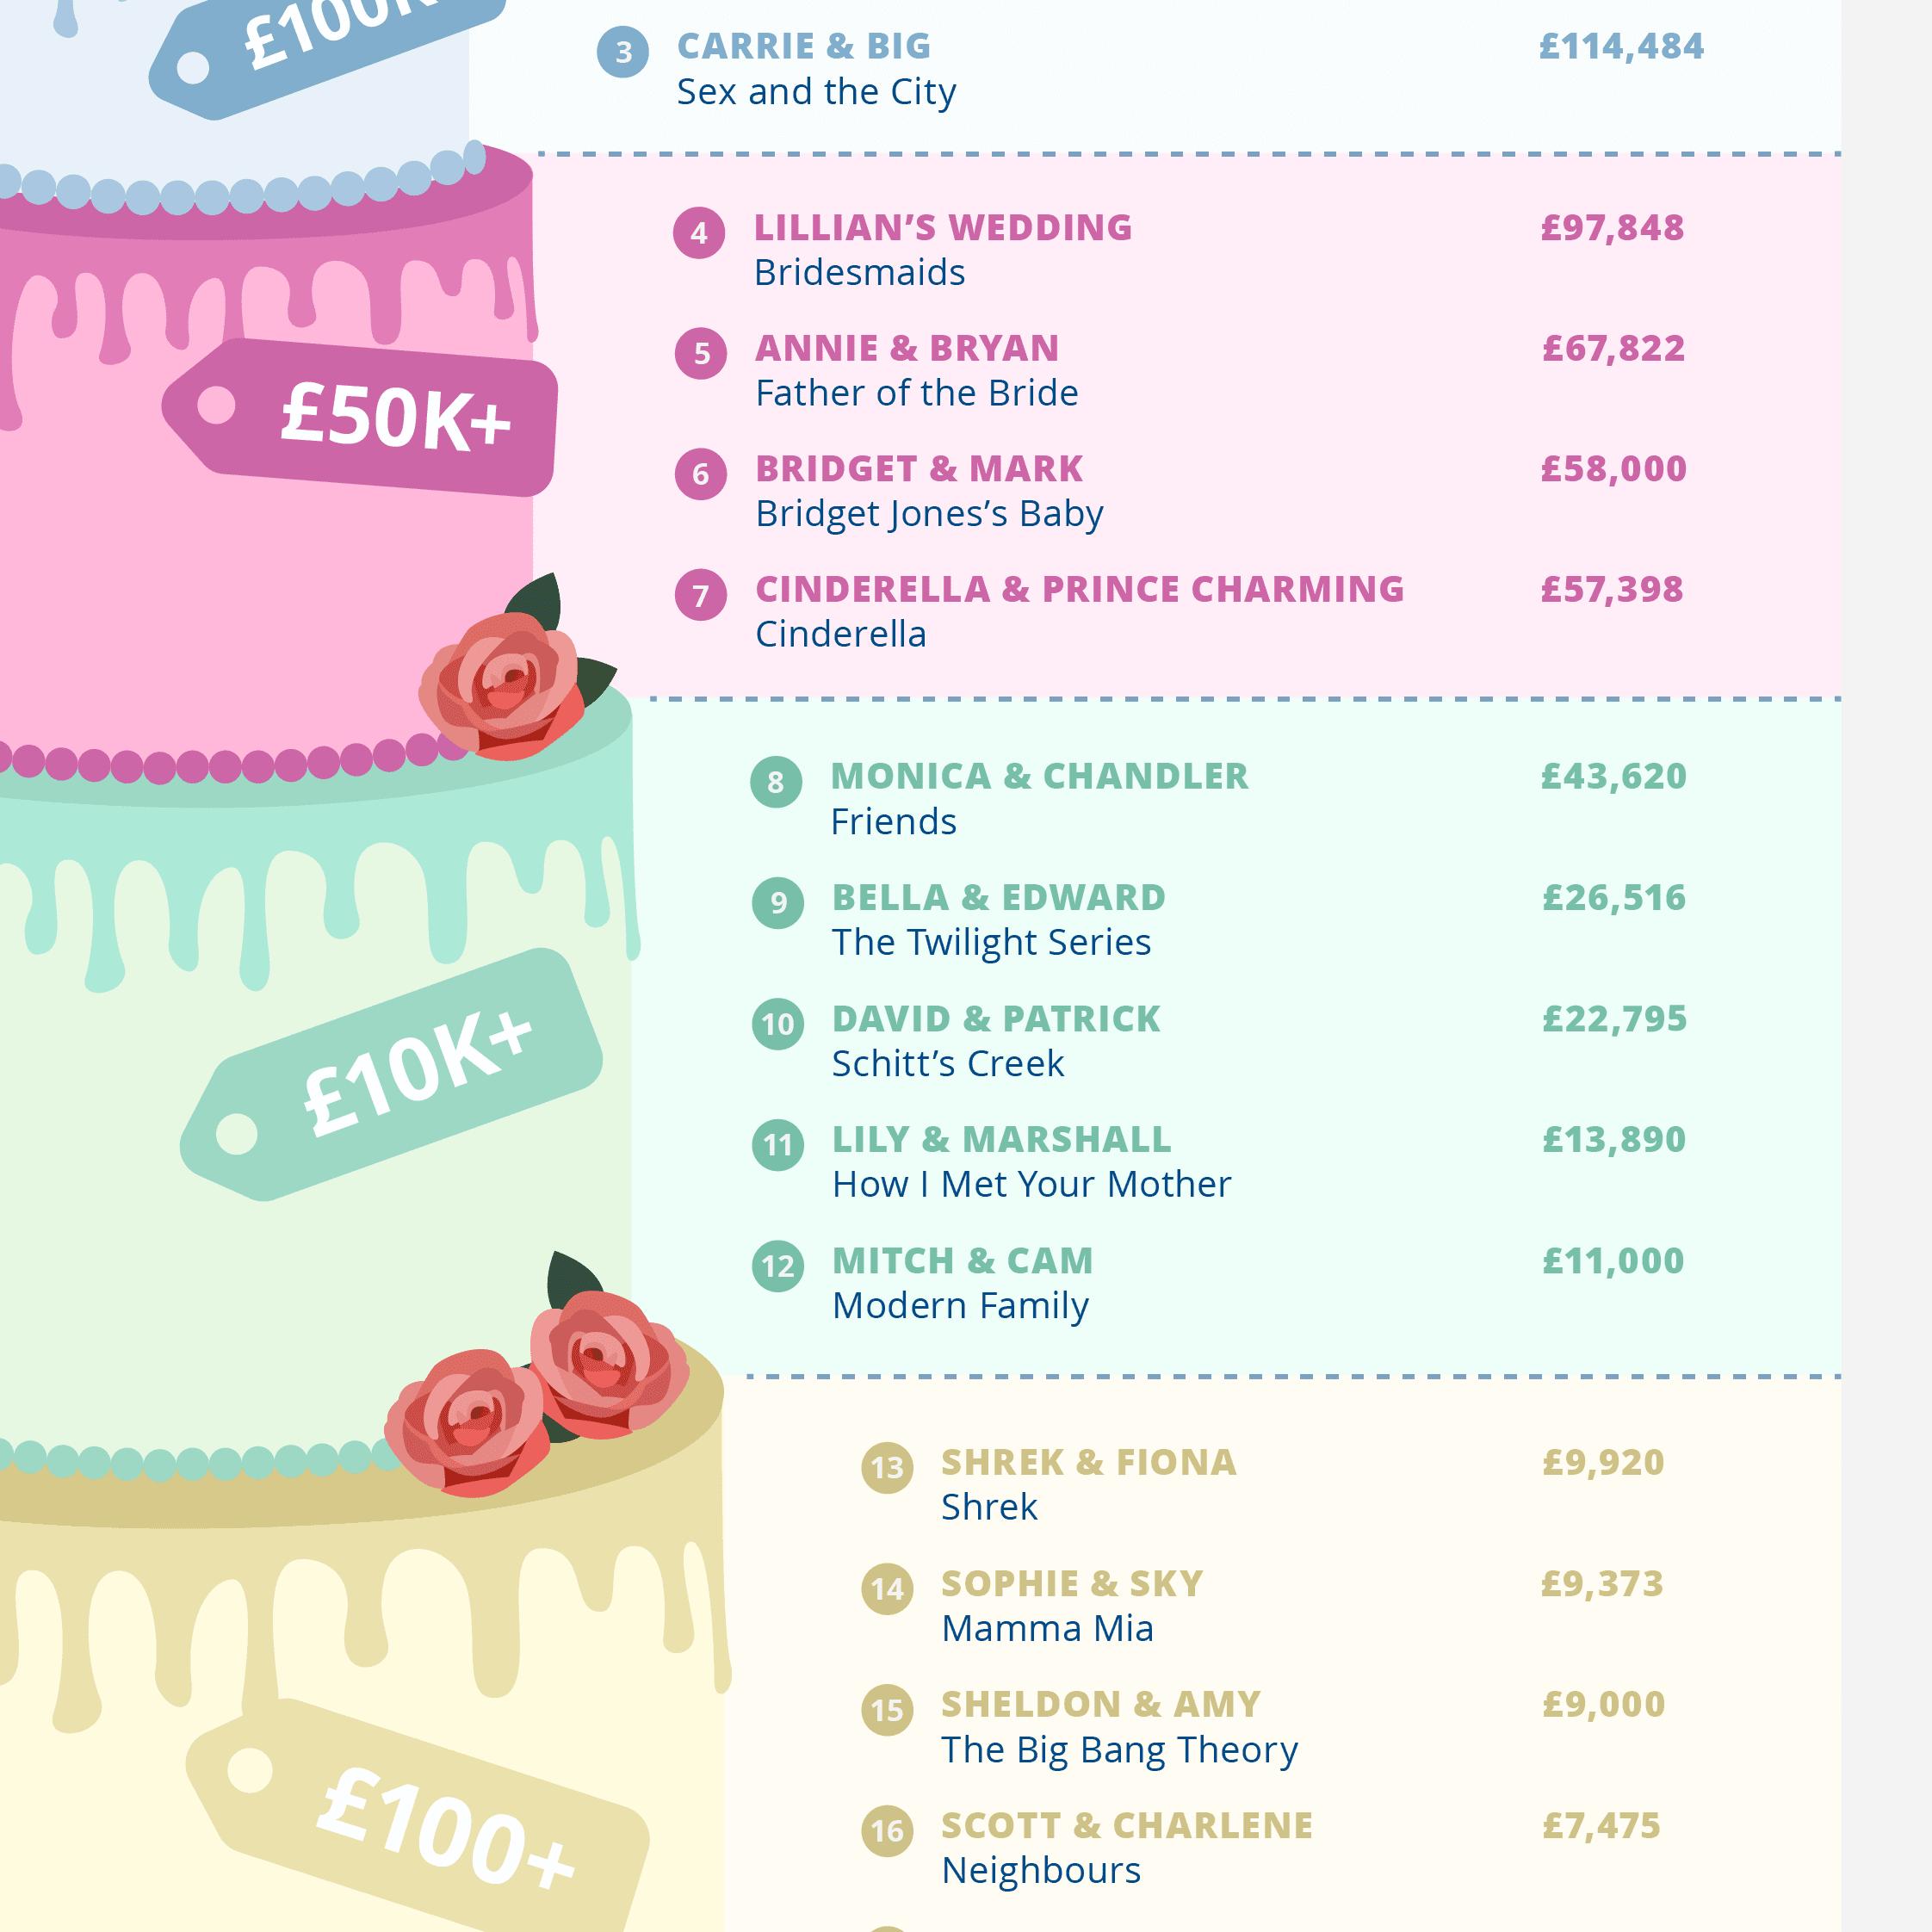 TV/Film Wedding Costs